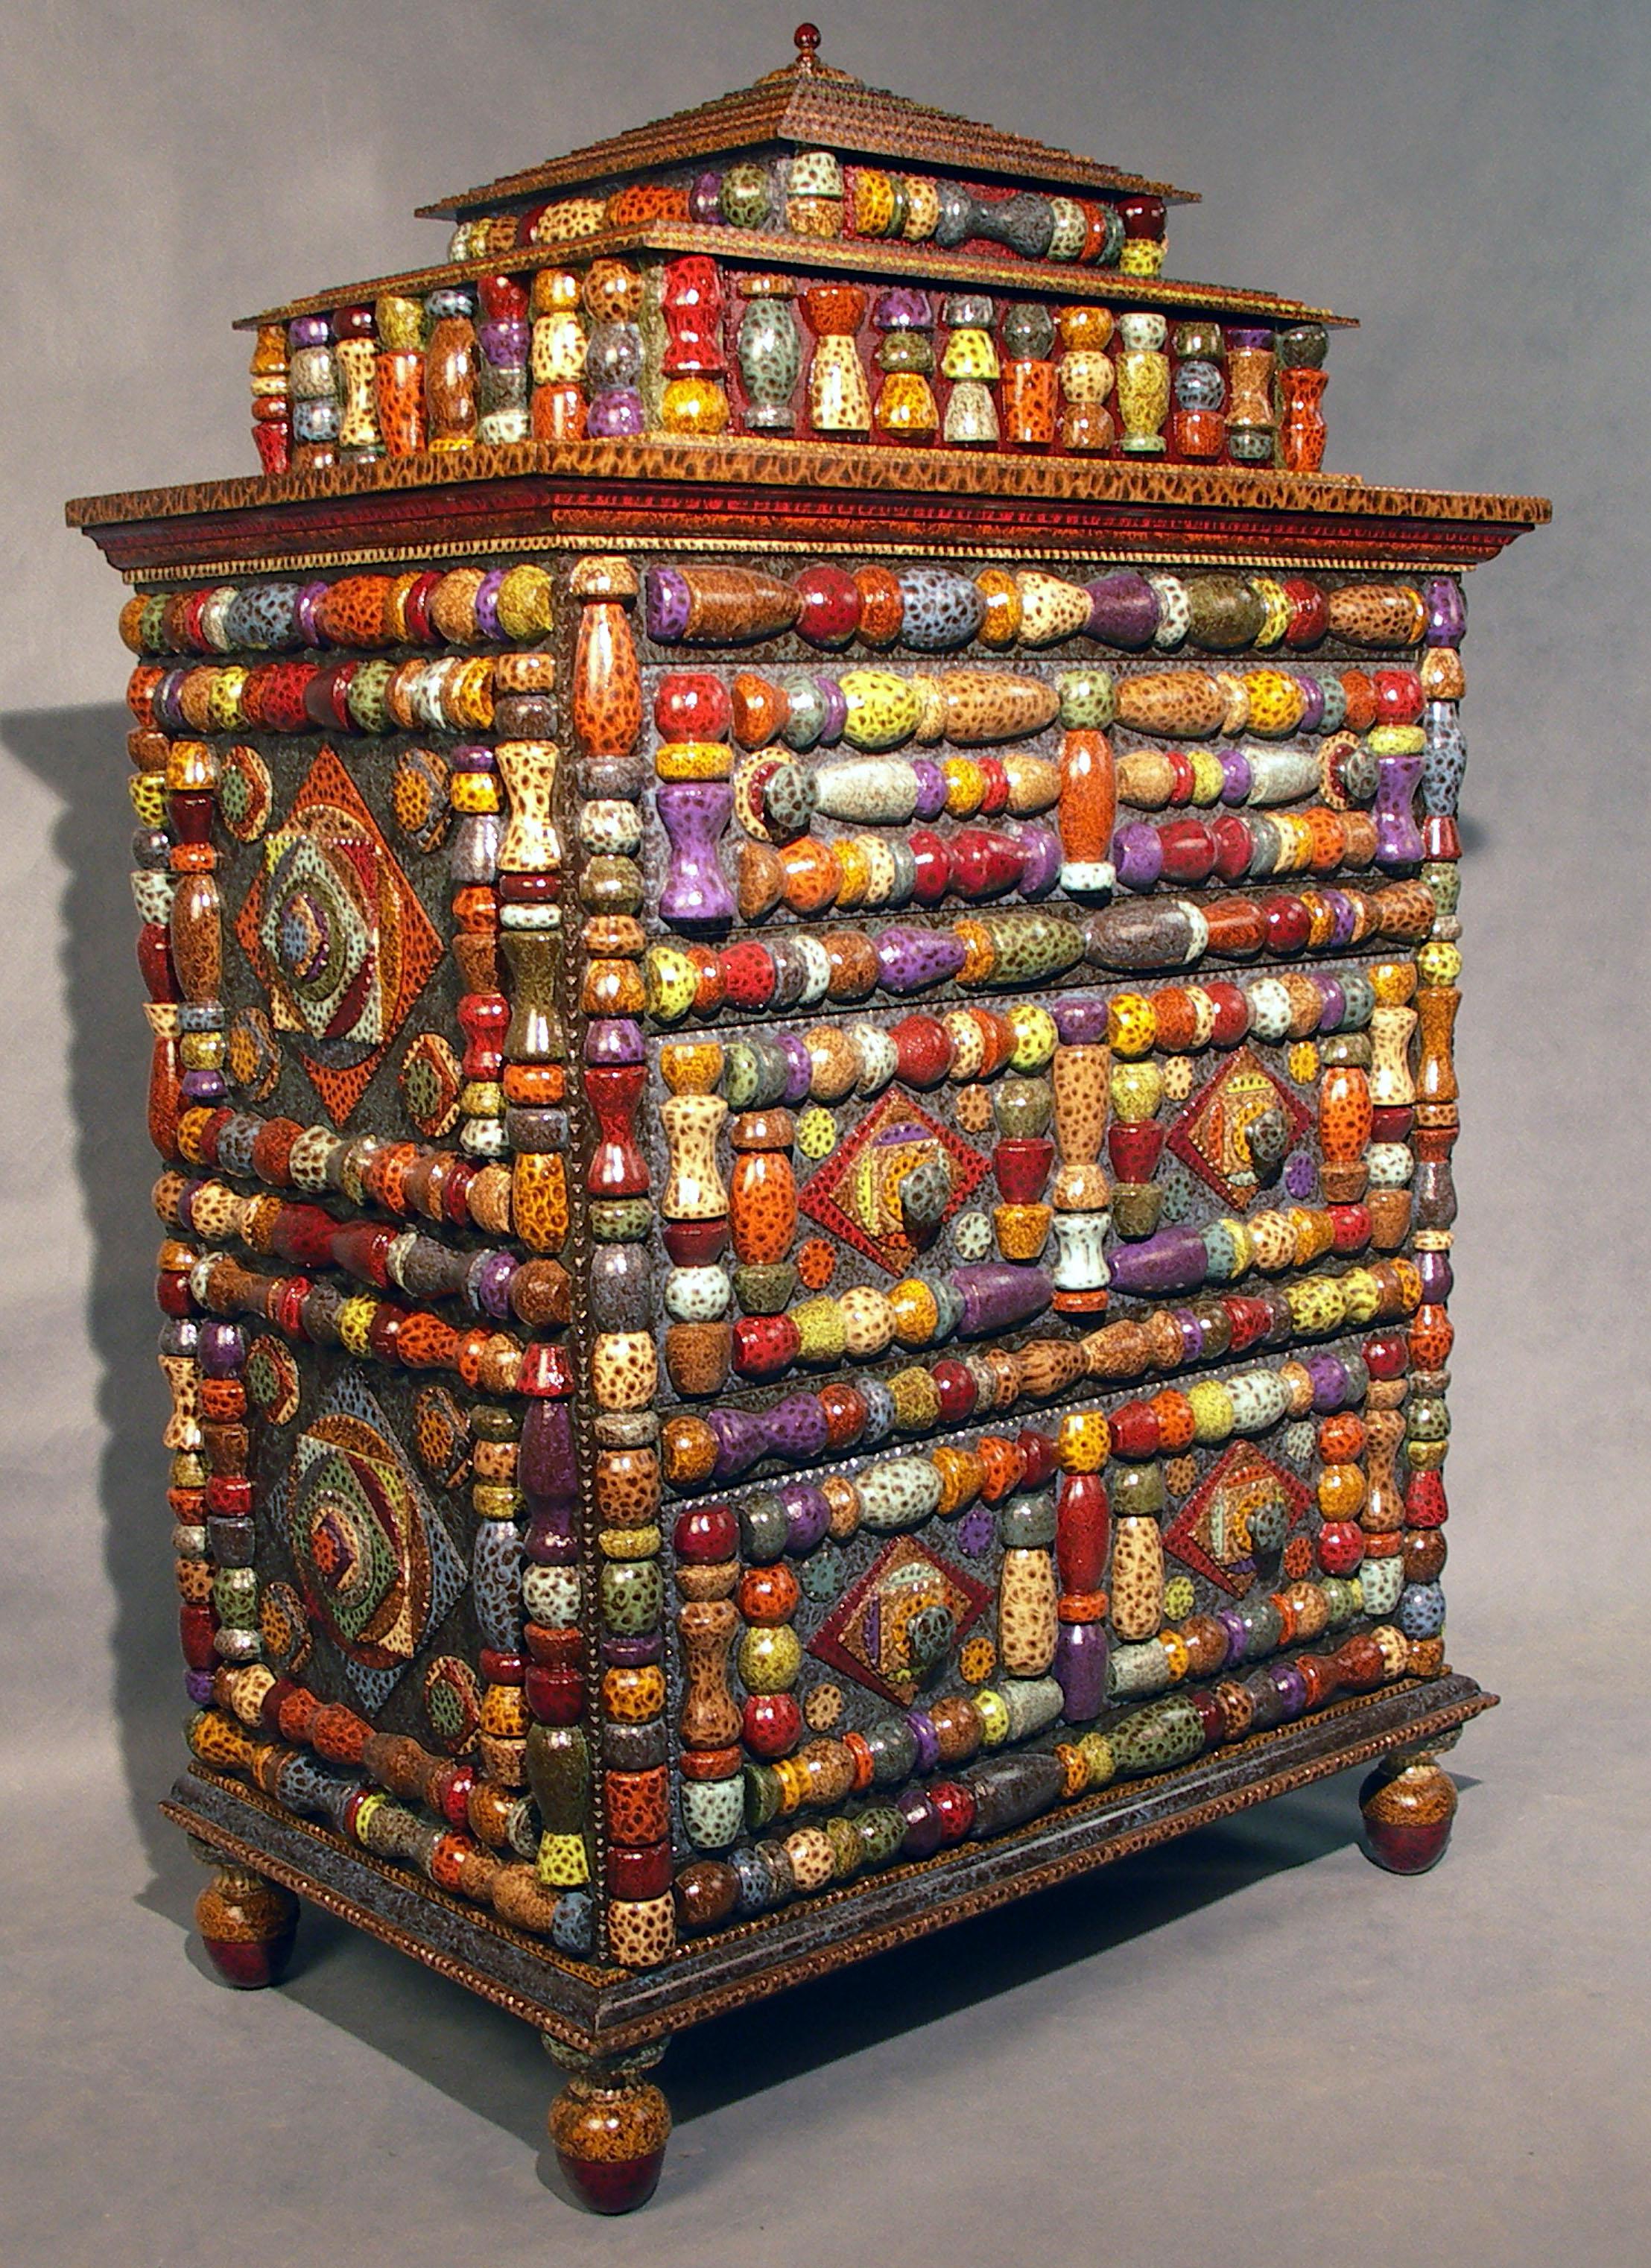 Furniture Photo Gallery Inspired by Tramp Art folk art